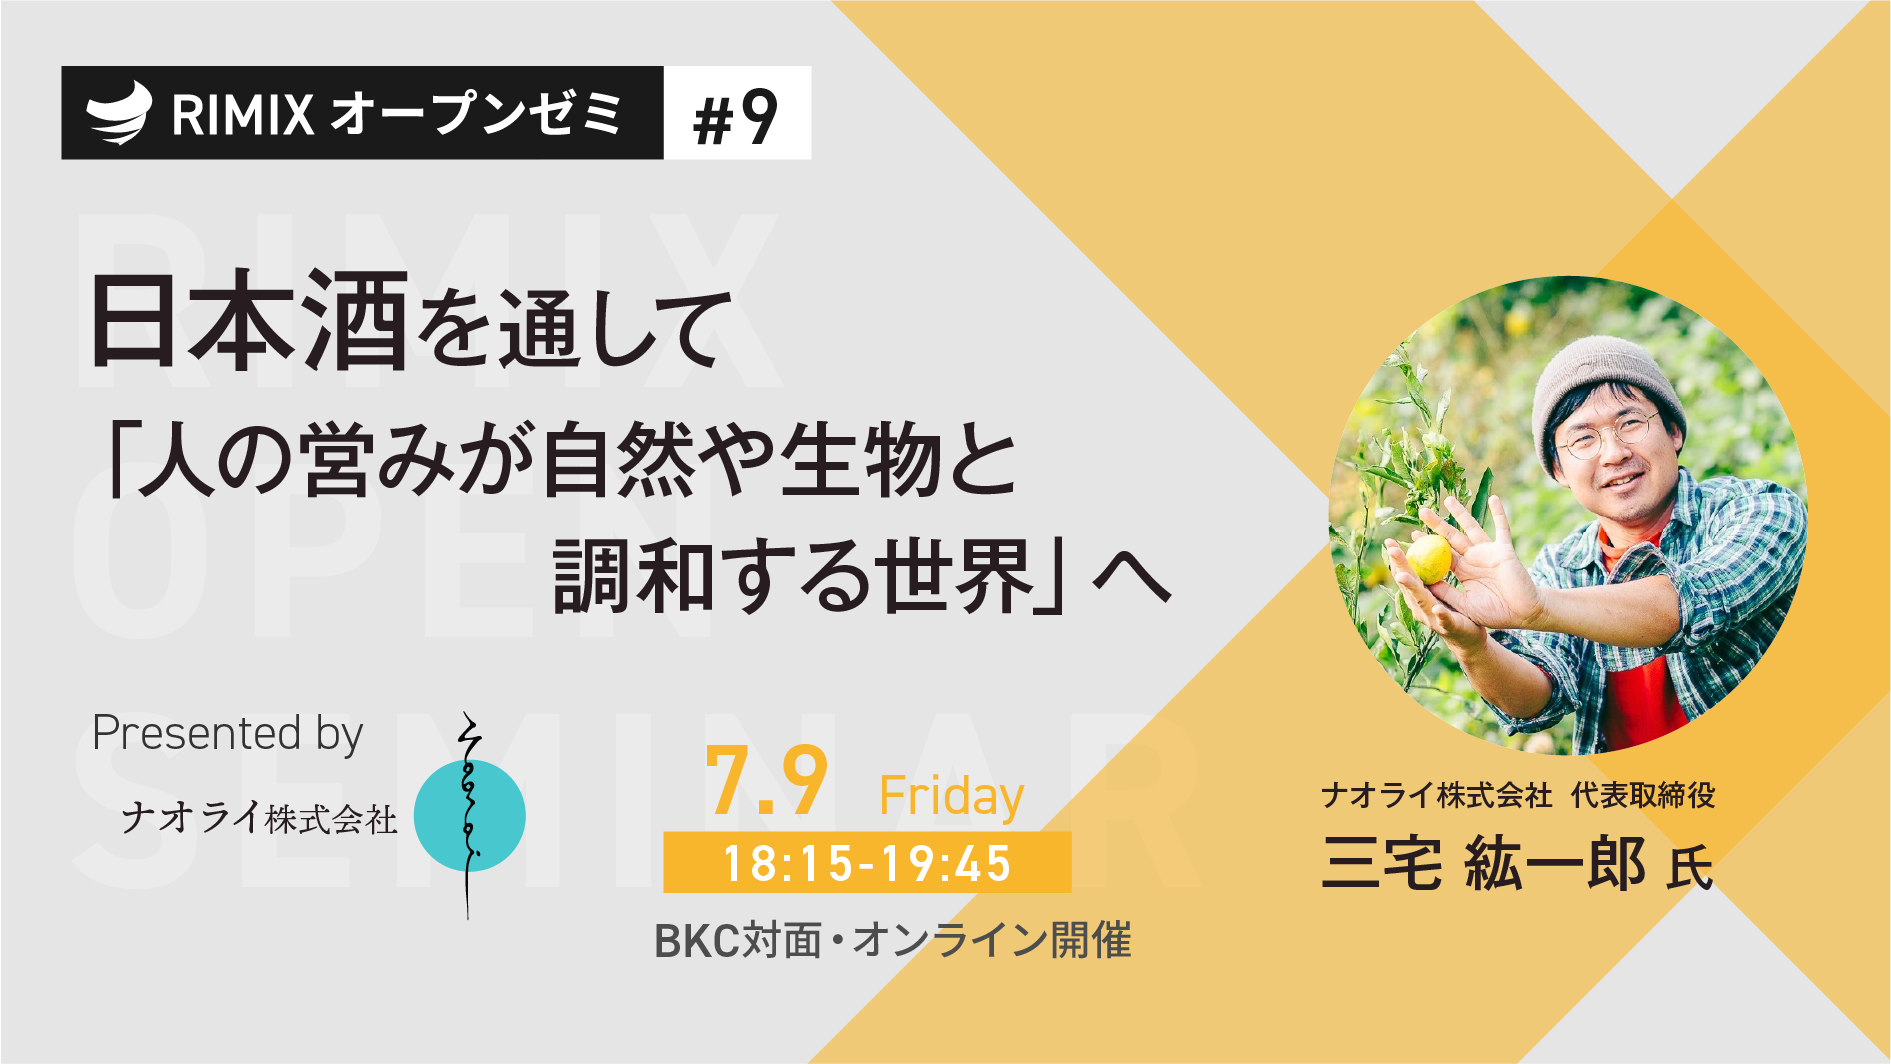 【RIMIXオープンゼミ#9】日本酒を通して「人の営みが自然や生物と調和する世界」へ Presented By ナオライ